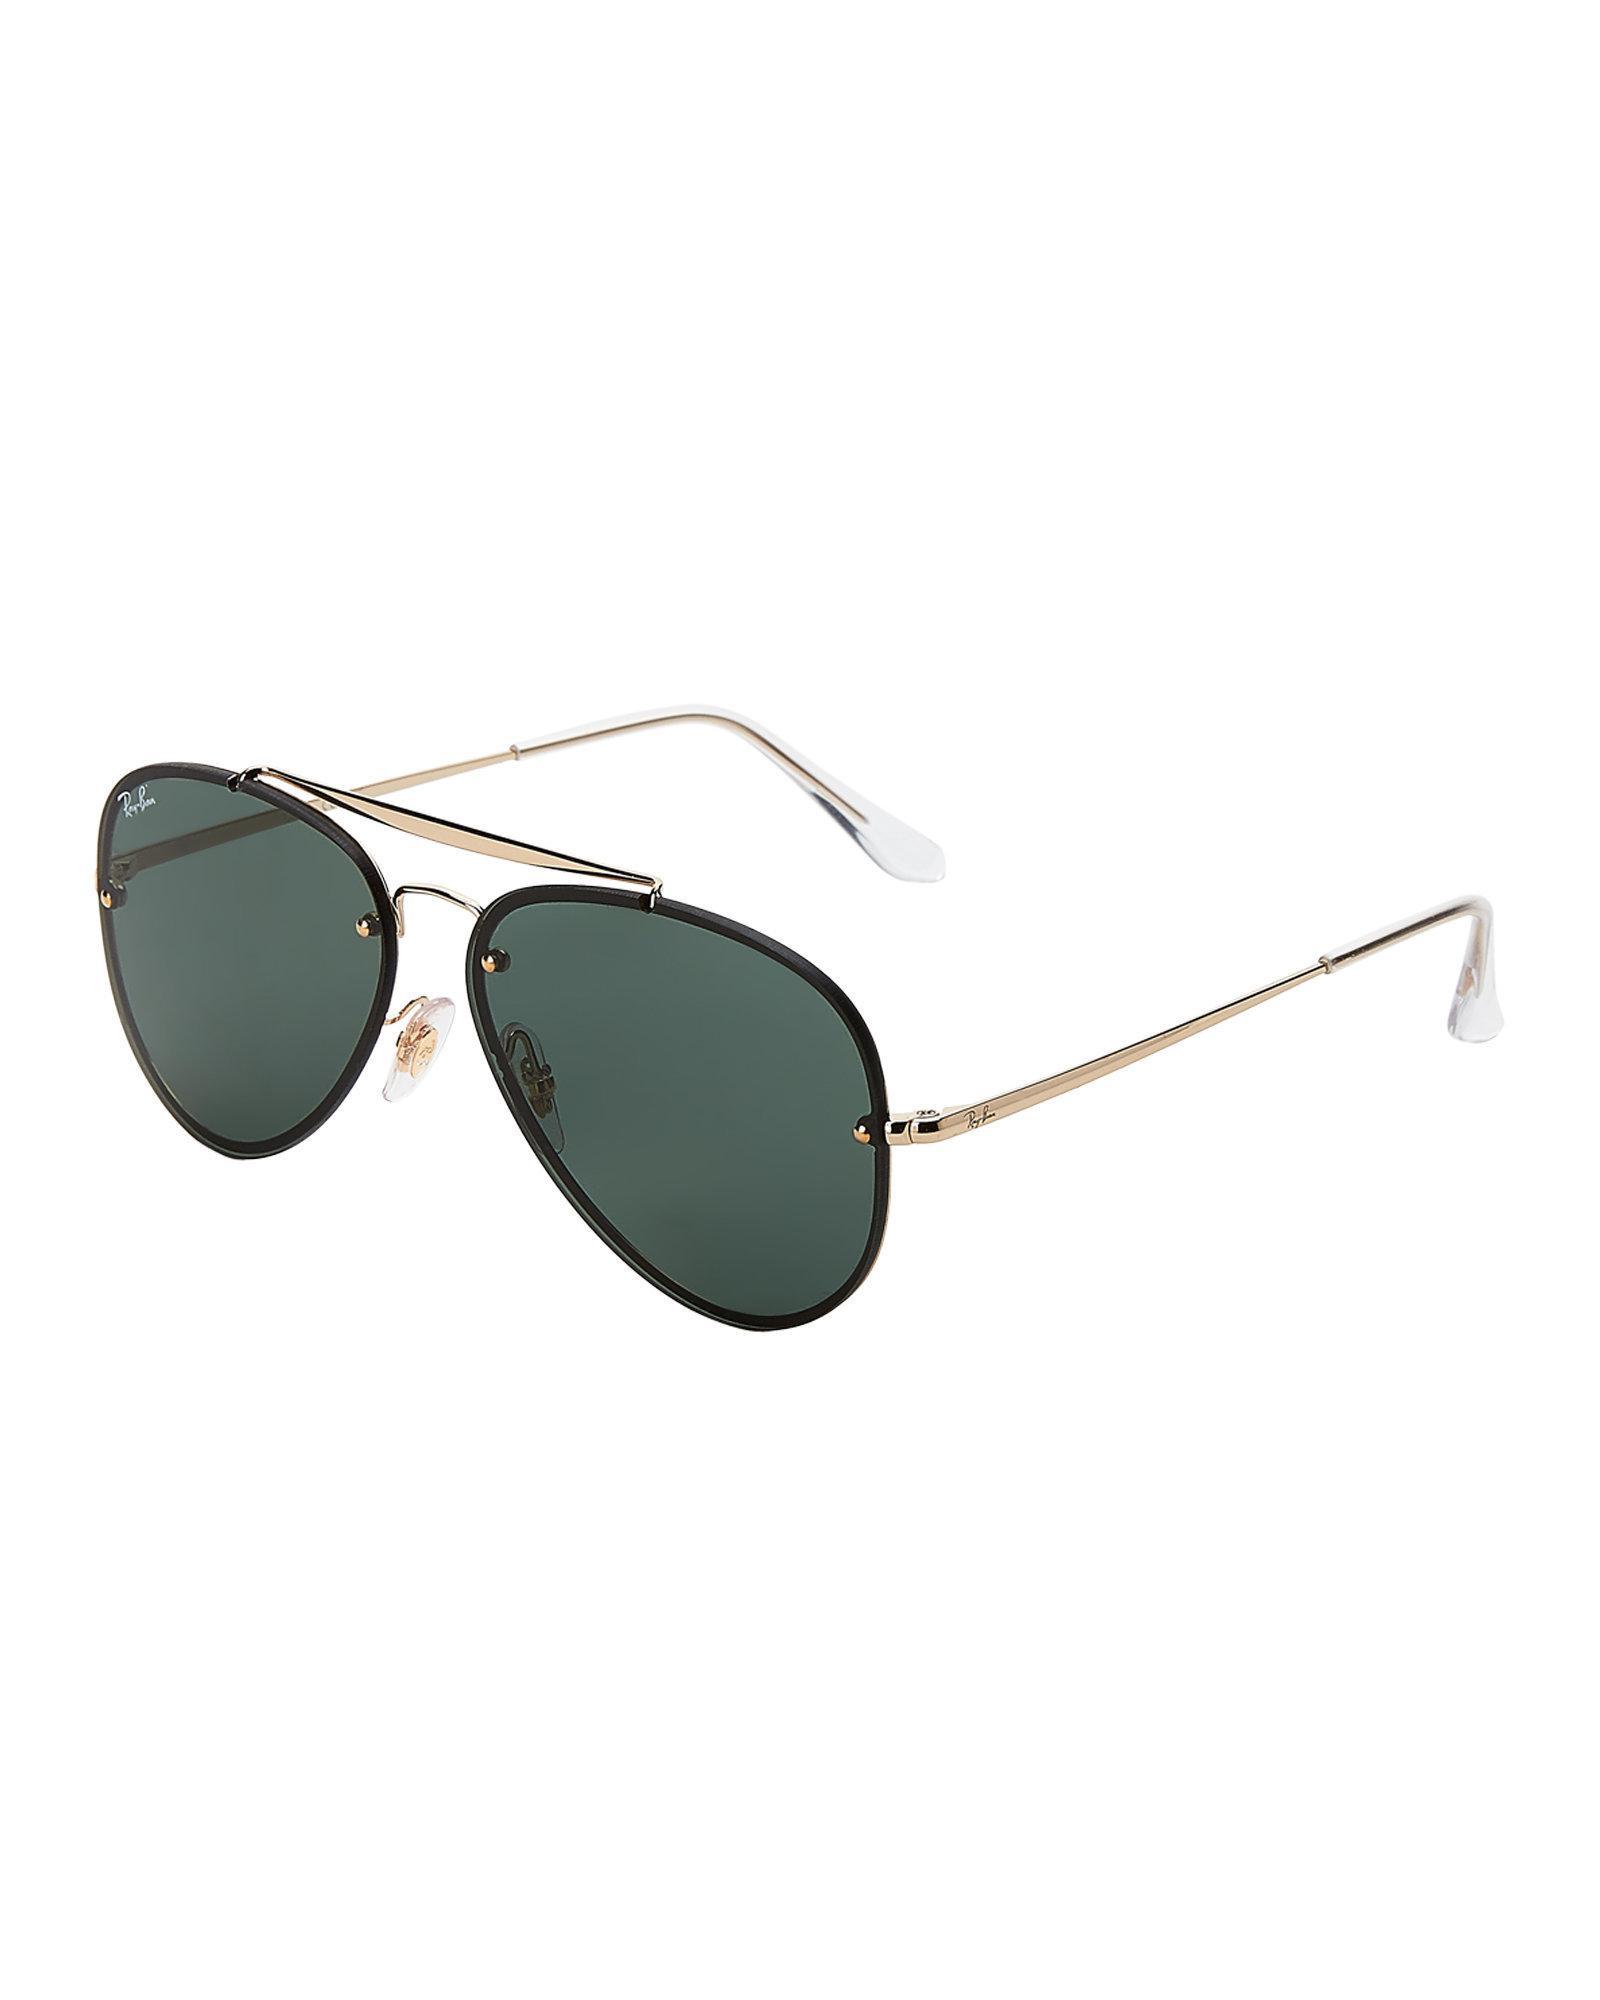 3309312e739 Lyst - Ray-Ban Rb 3584 Gold-tone Aviator Sunglasses for Men